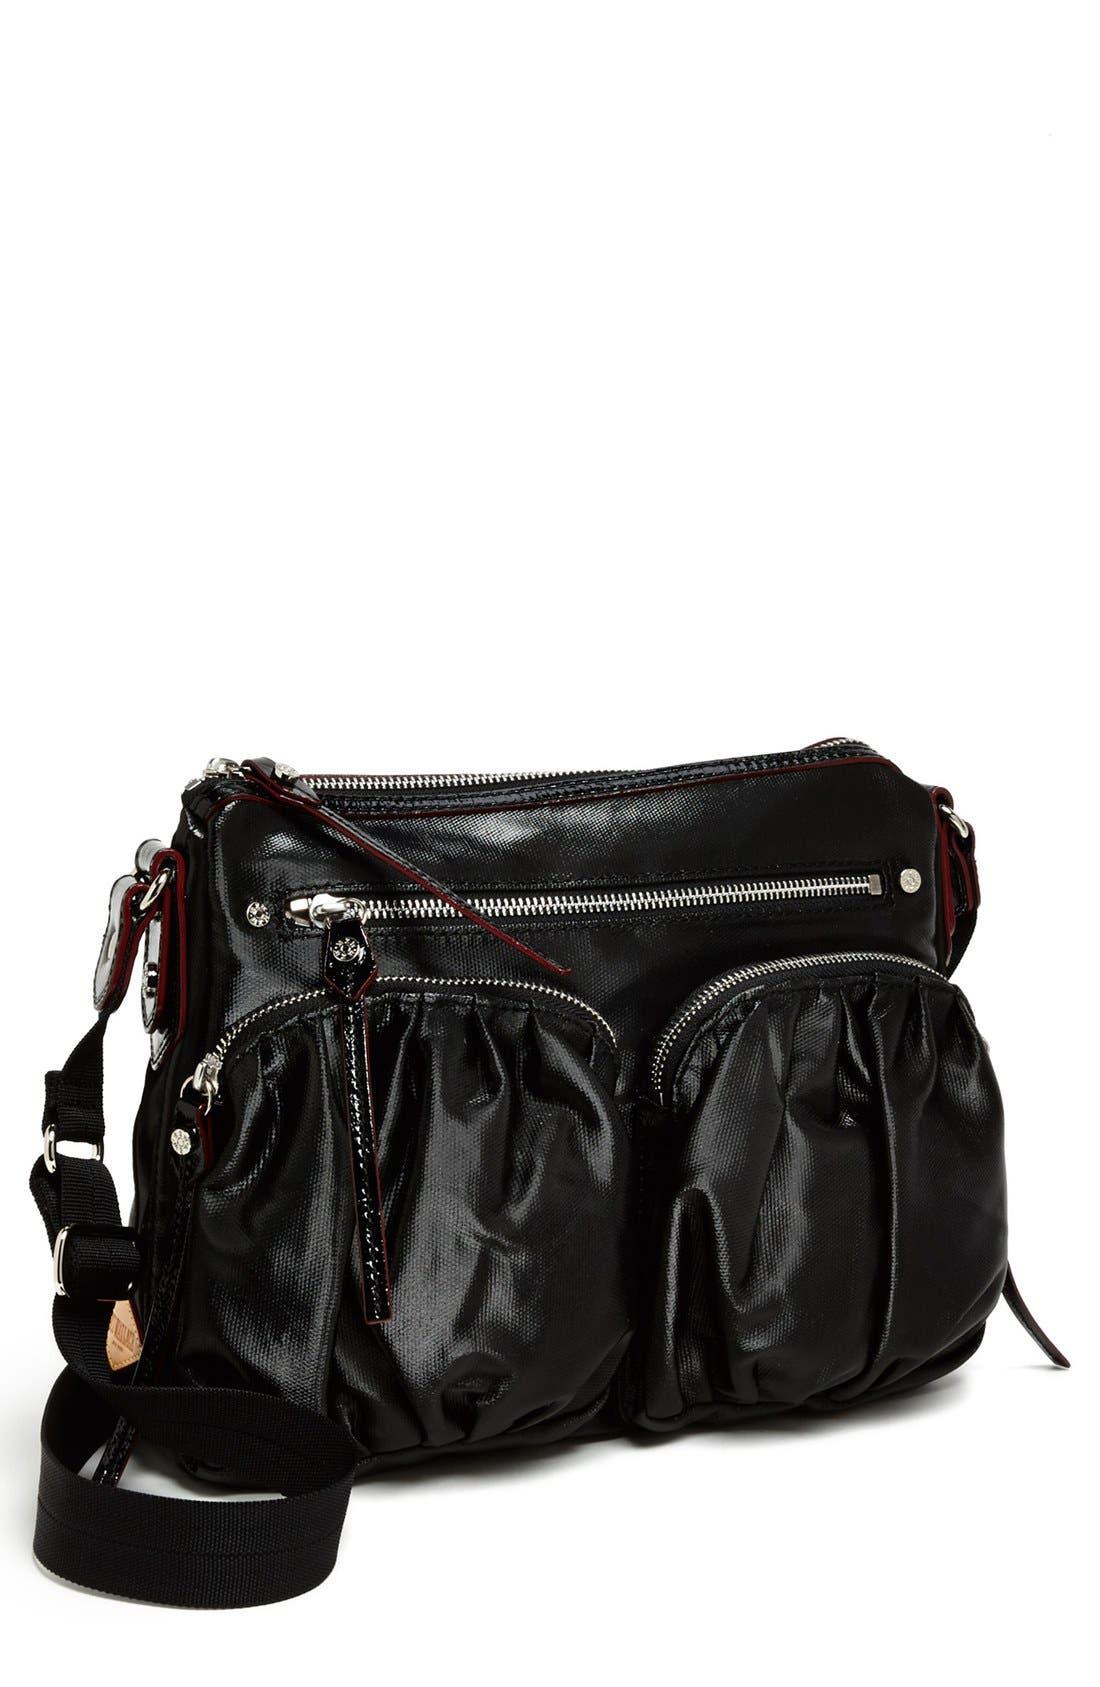 Main Image - MZ Wallace 'Paige' Crossbody bag, Small